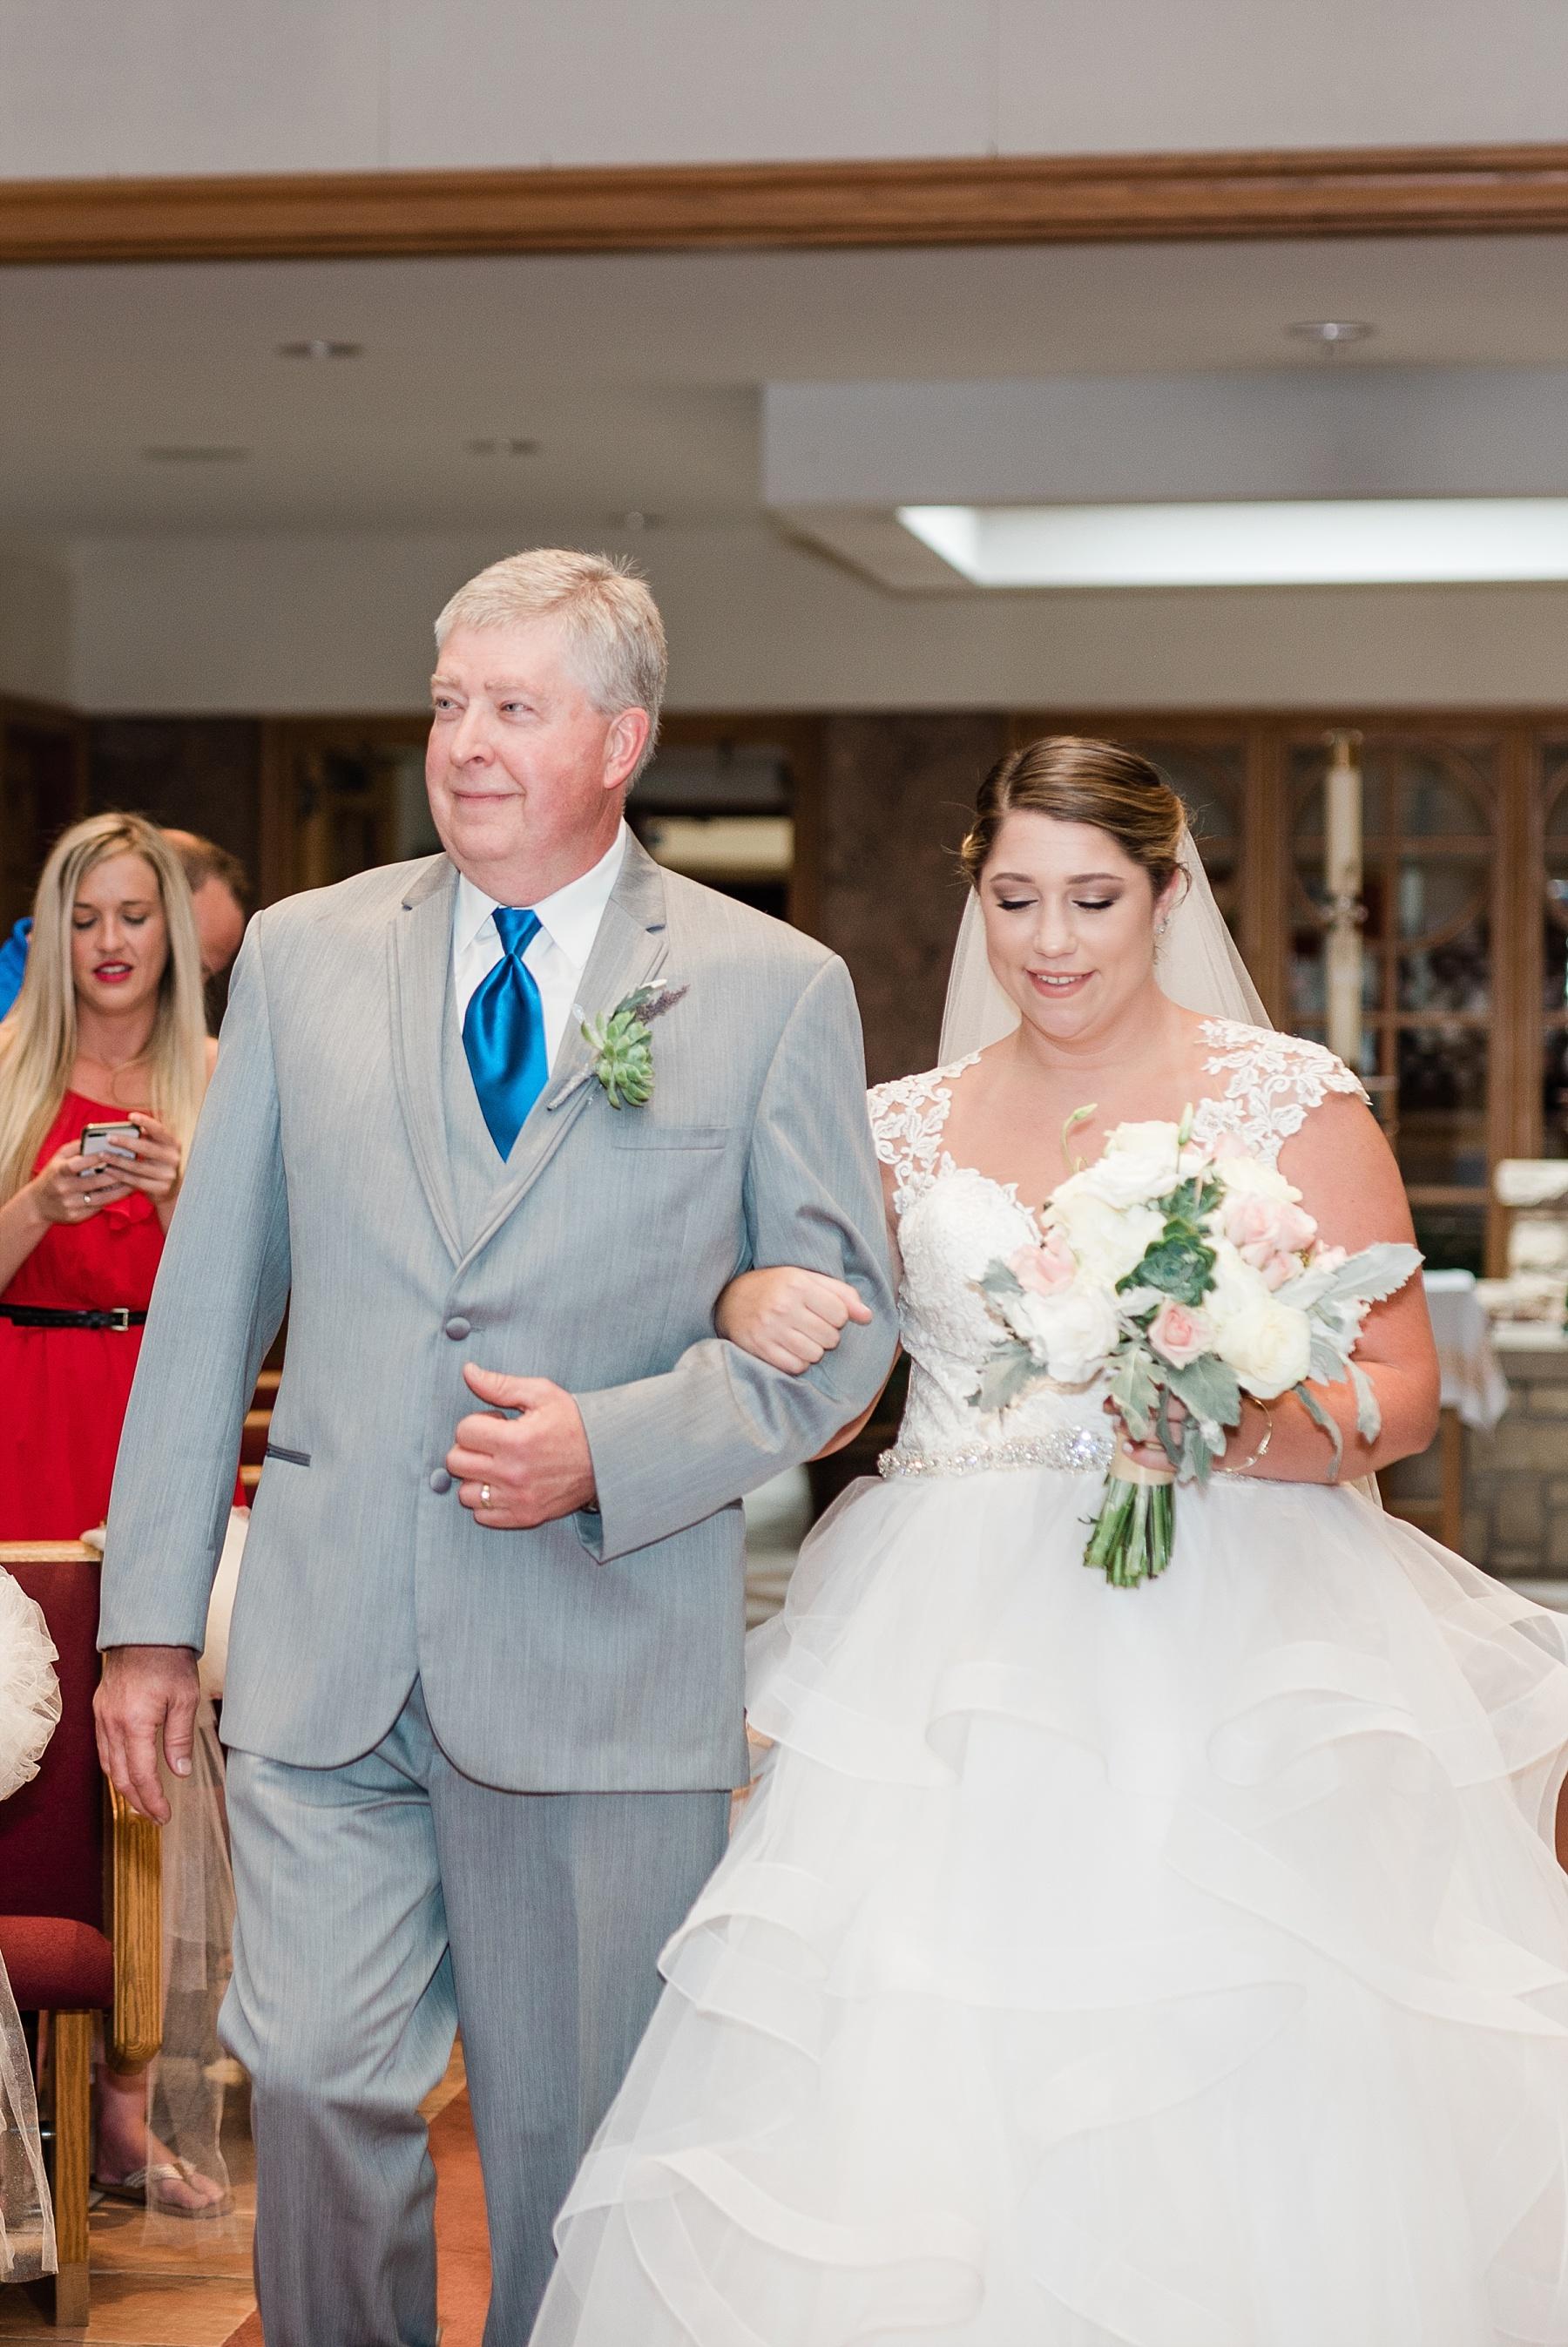 Baurichter Wedding at Stoney Creek Inn Columbia Missouri by Kelsi Kliethermes Photography_0011.jpg